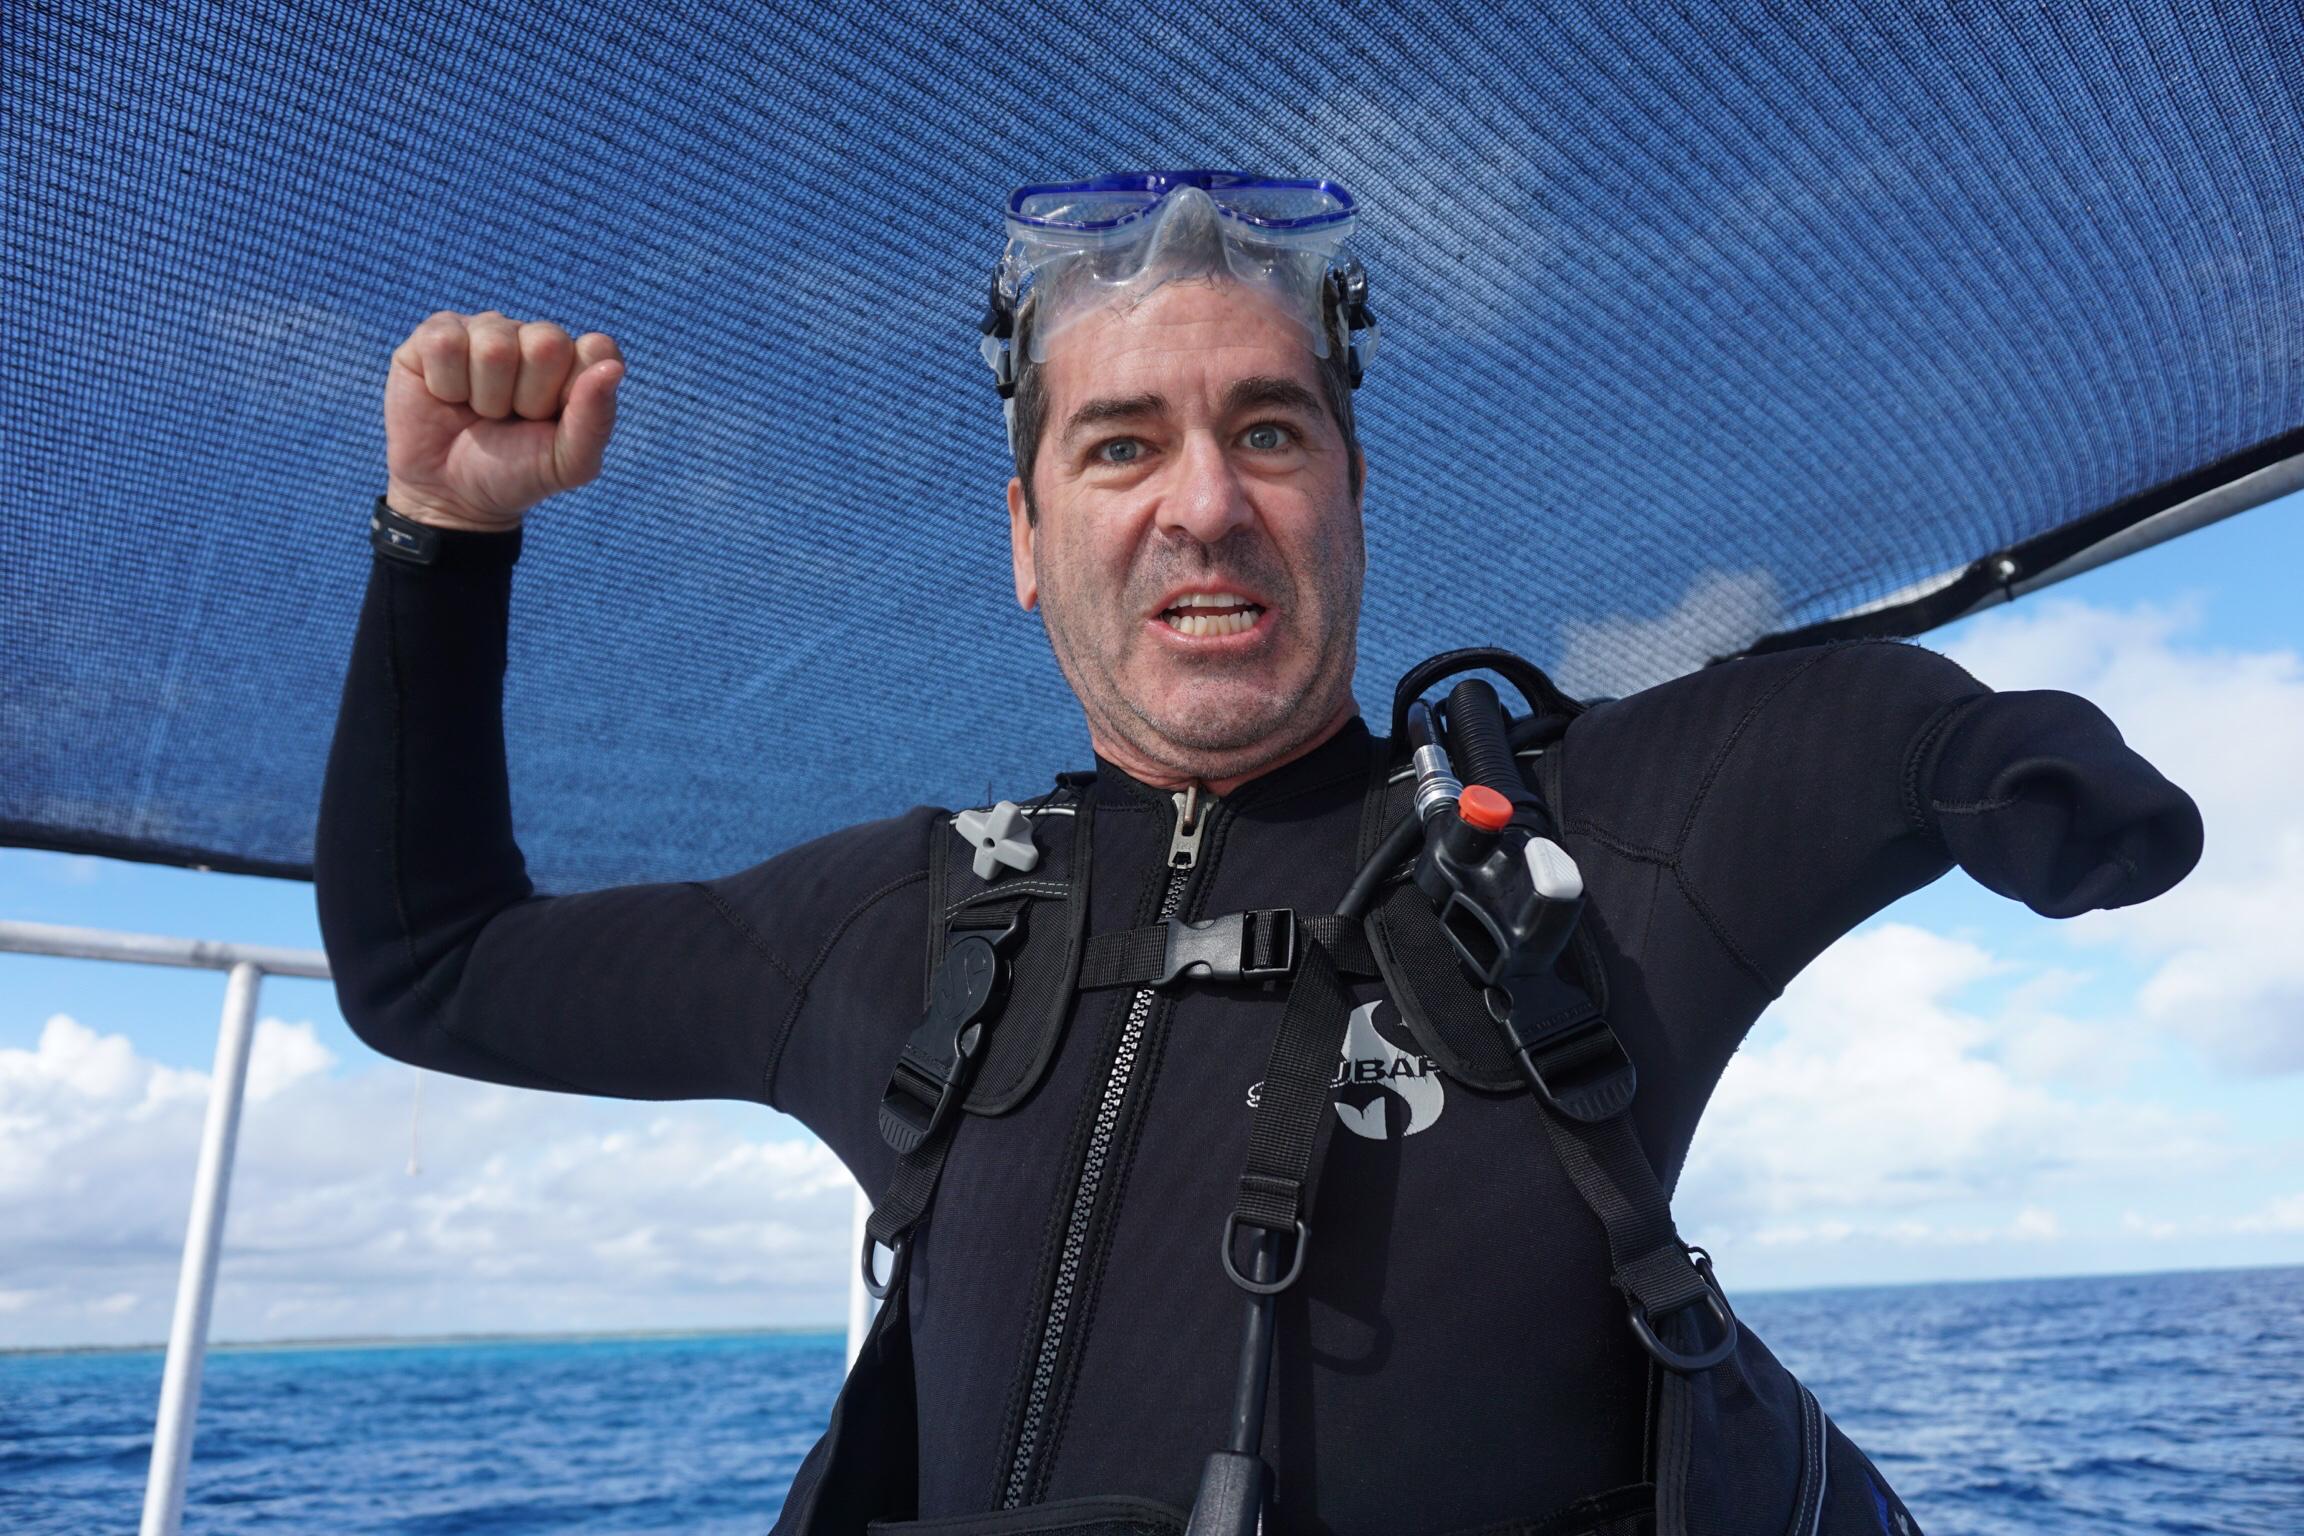 Scuba diving  off Andros Island, the Bahamas in January. Photo by Suzi Tobias